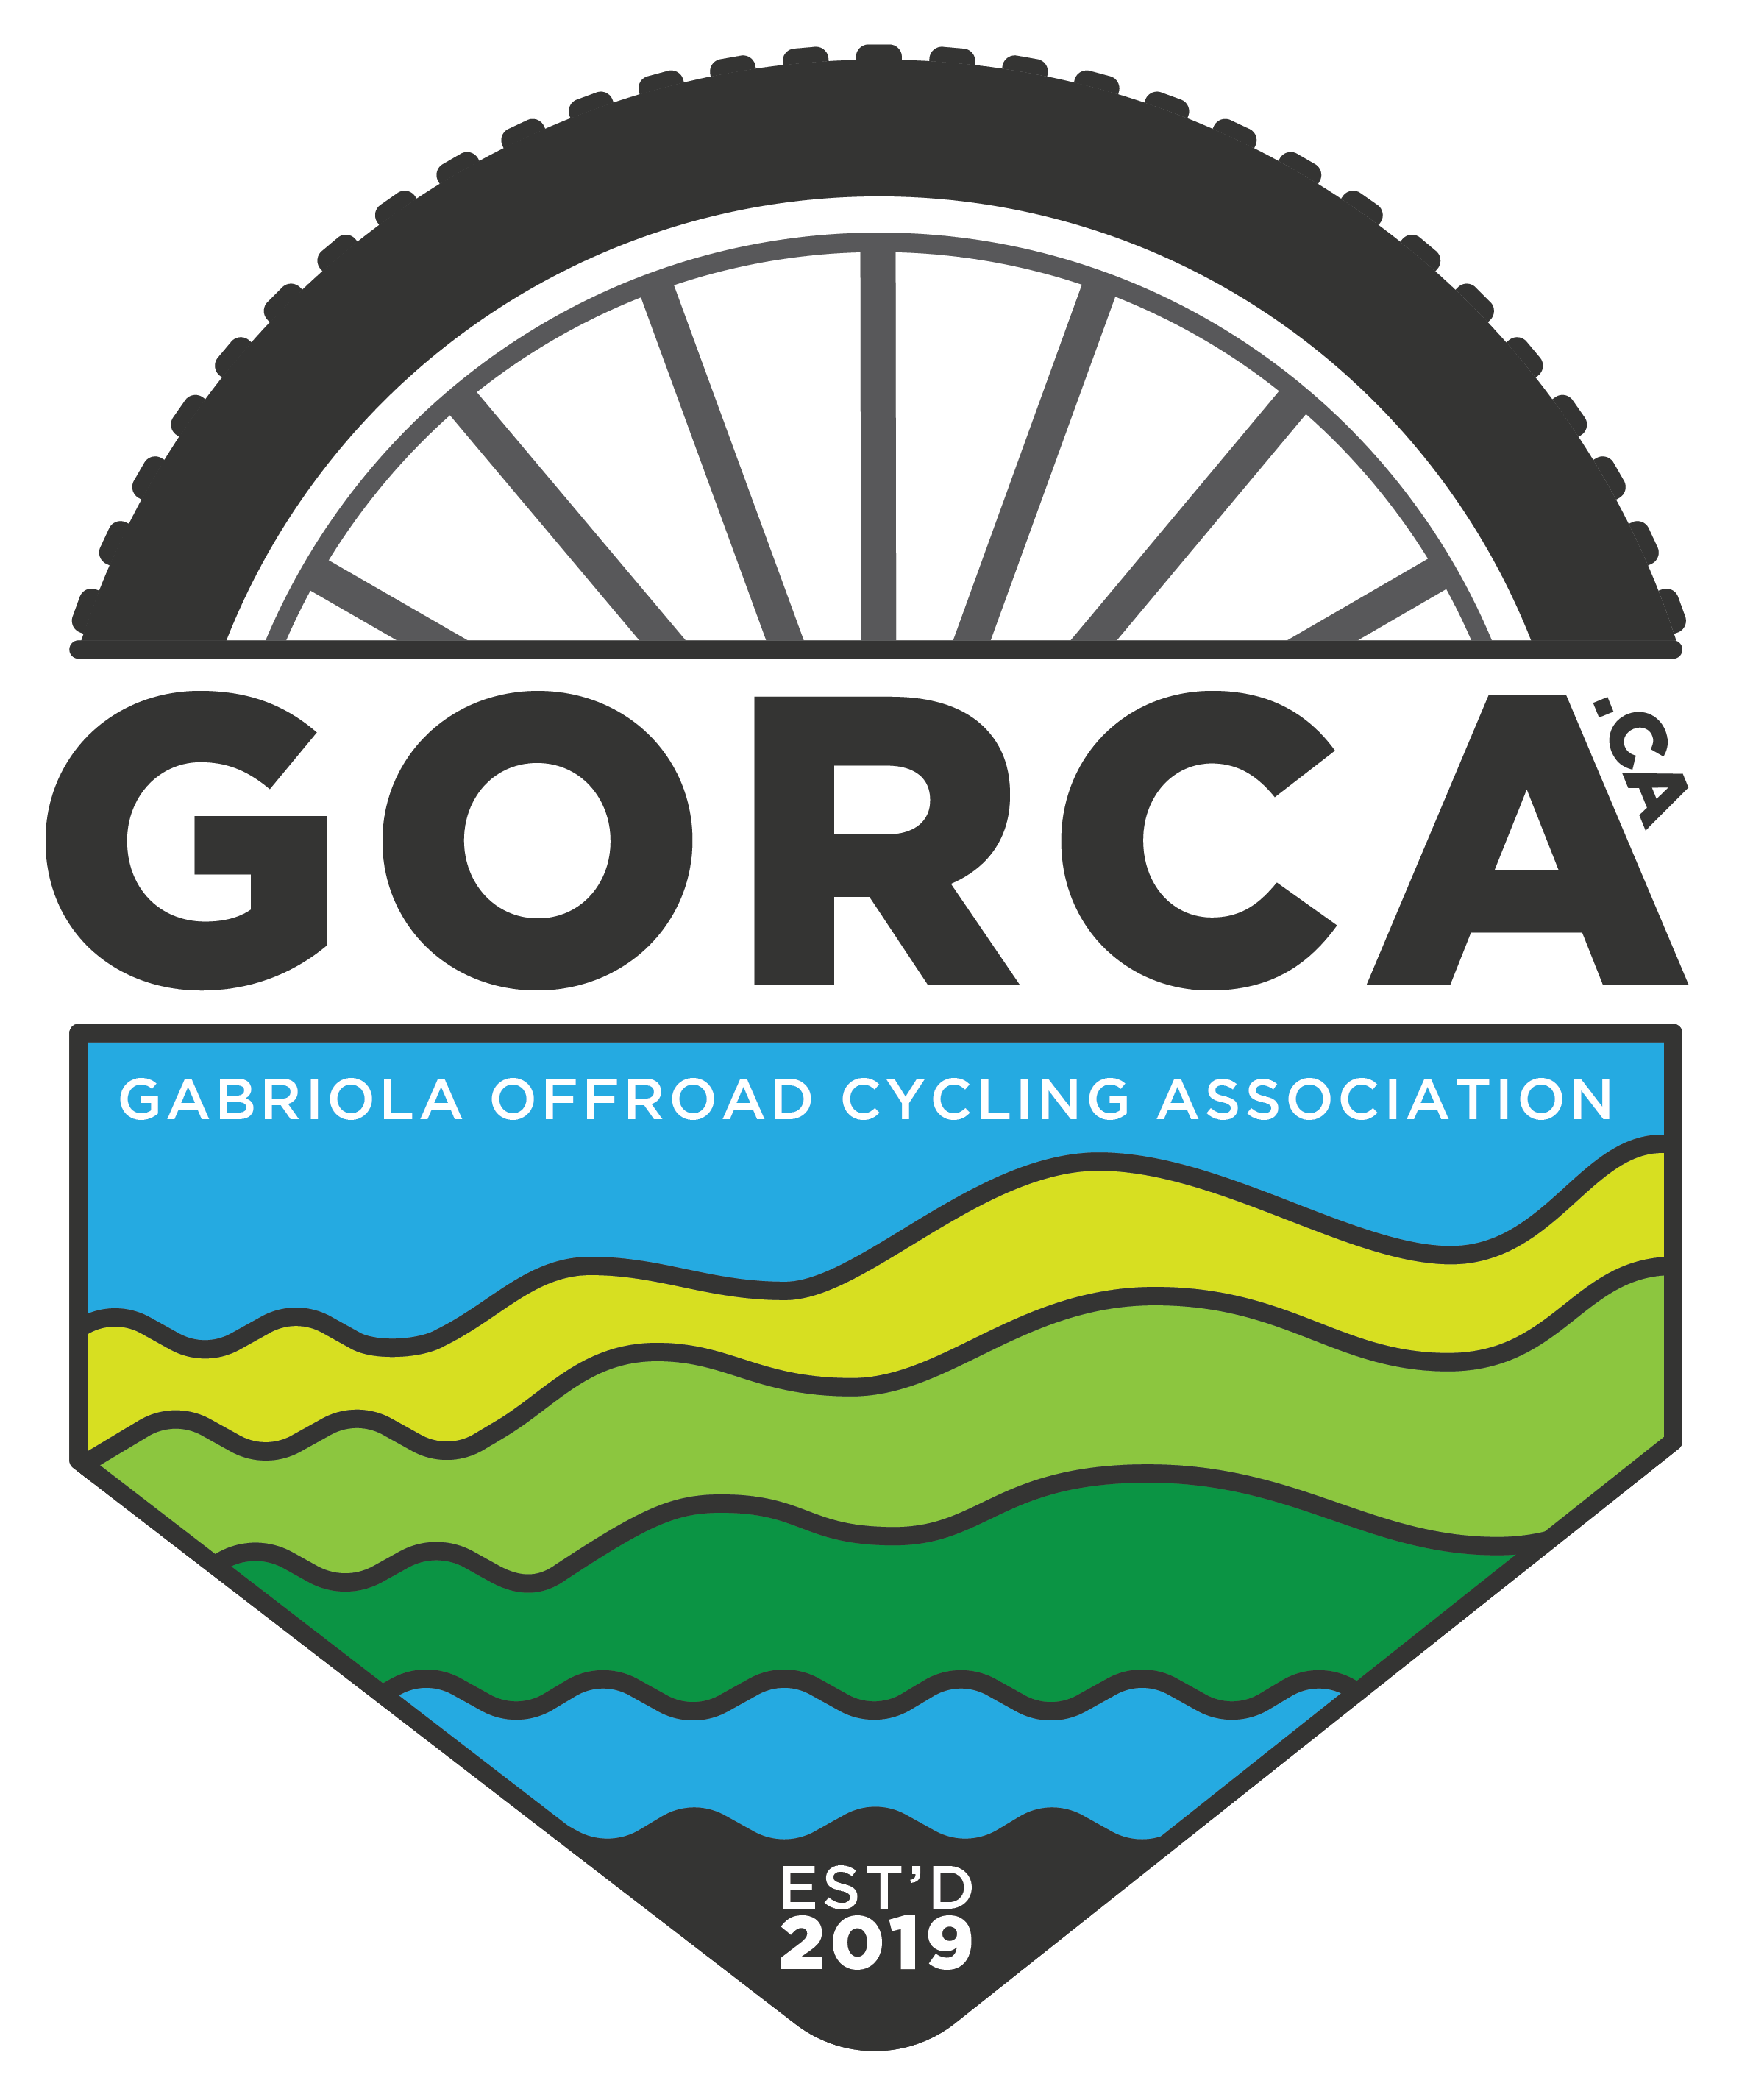 GORCA Logo Master_GORCA-4c-Large.png